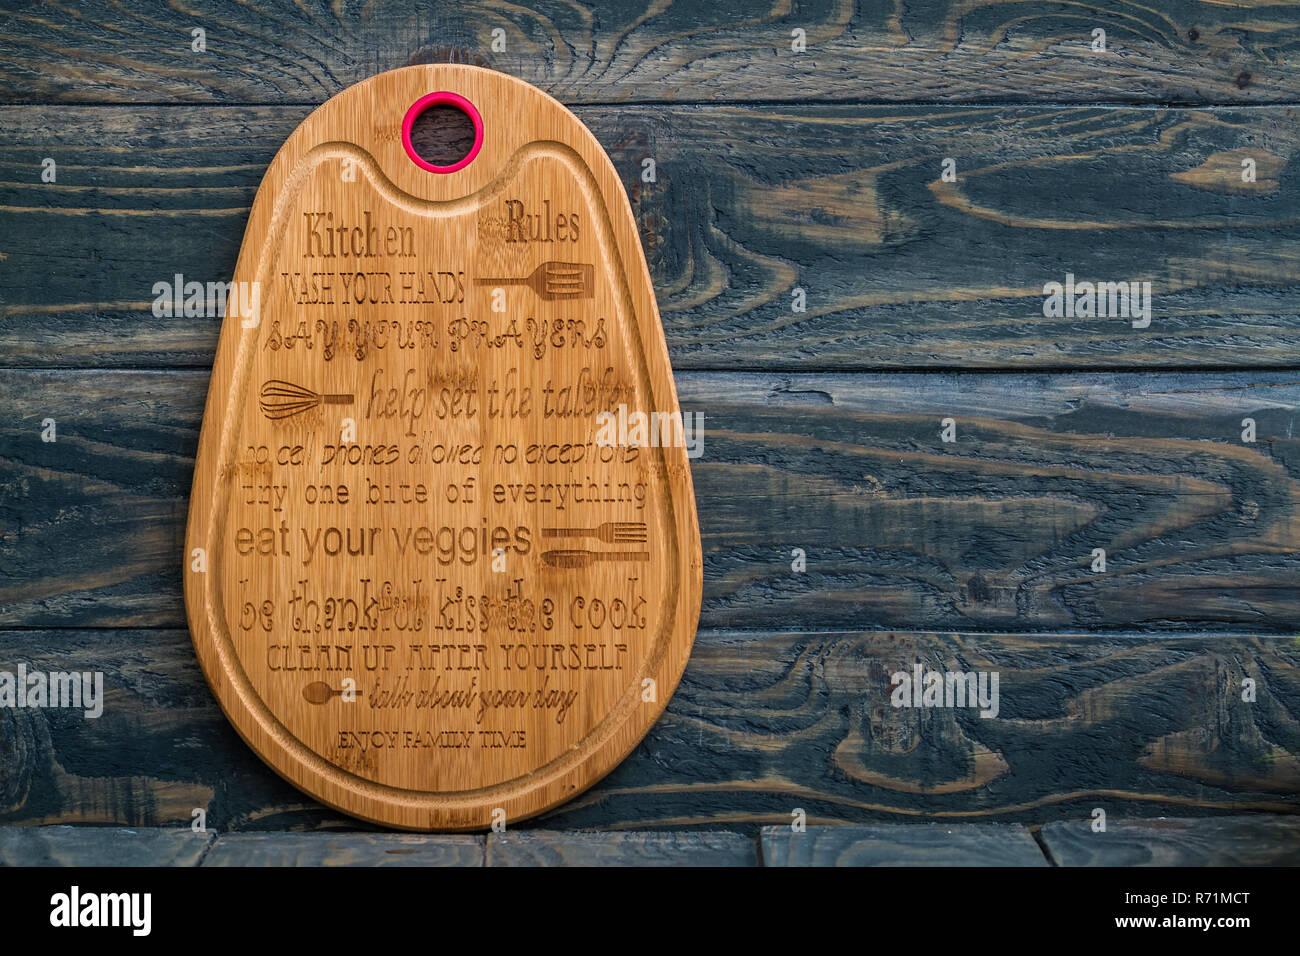 Dekorative Holz Kuche Mit Kuche Regeln Stockfoto Bild 228075368